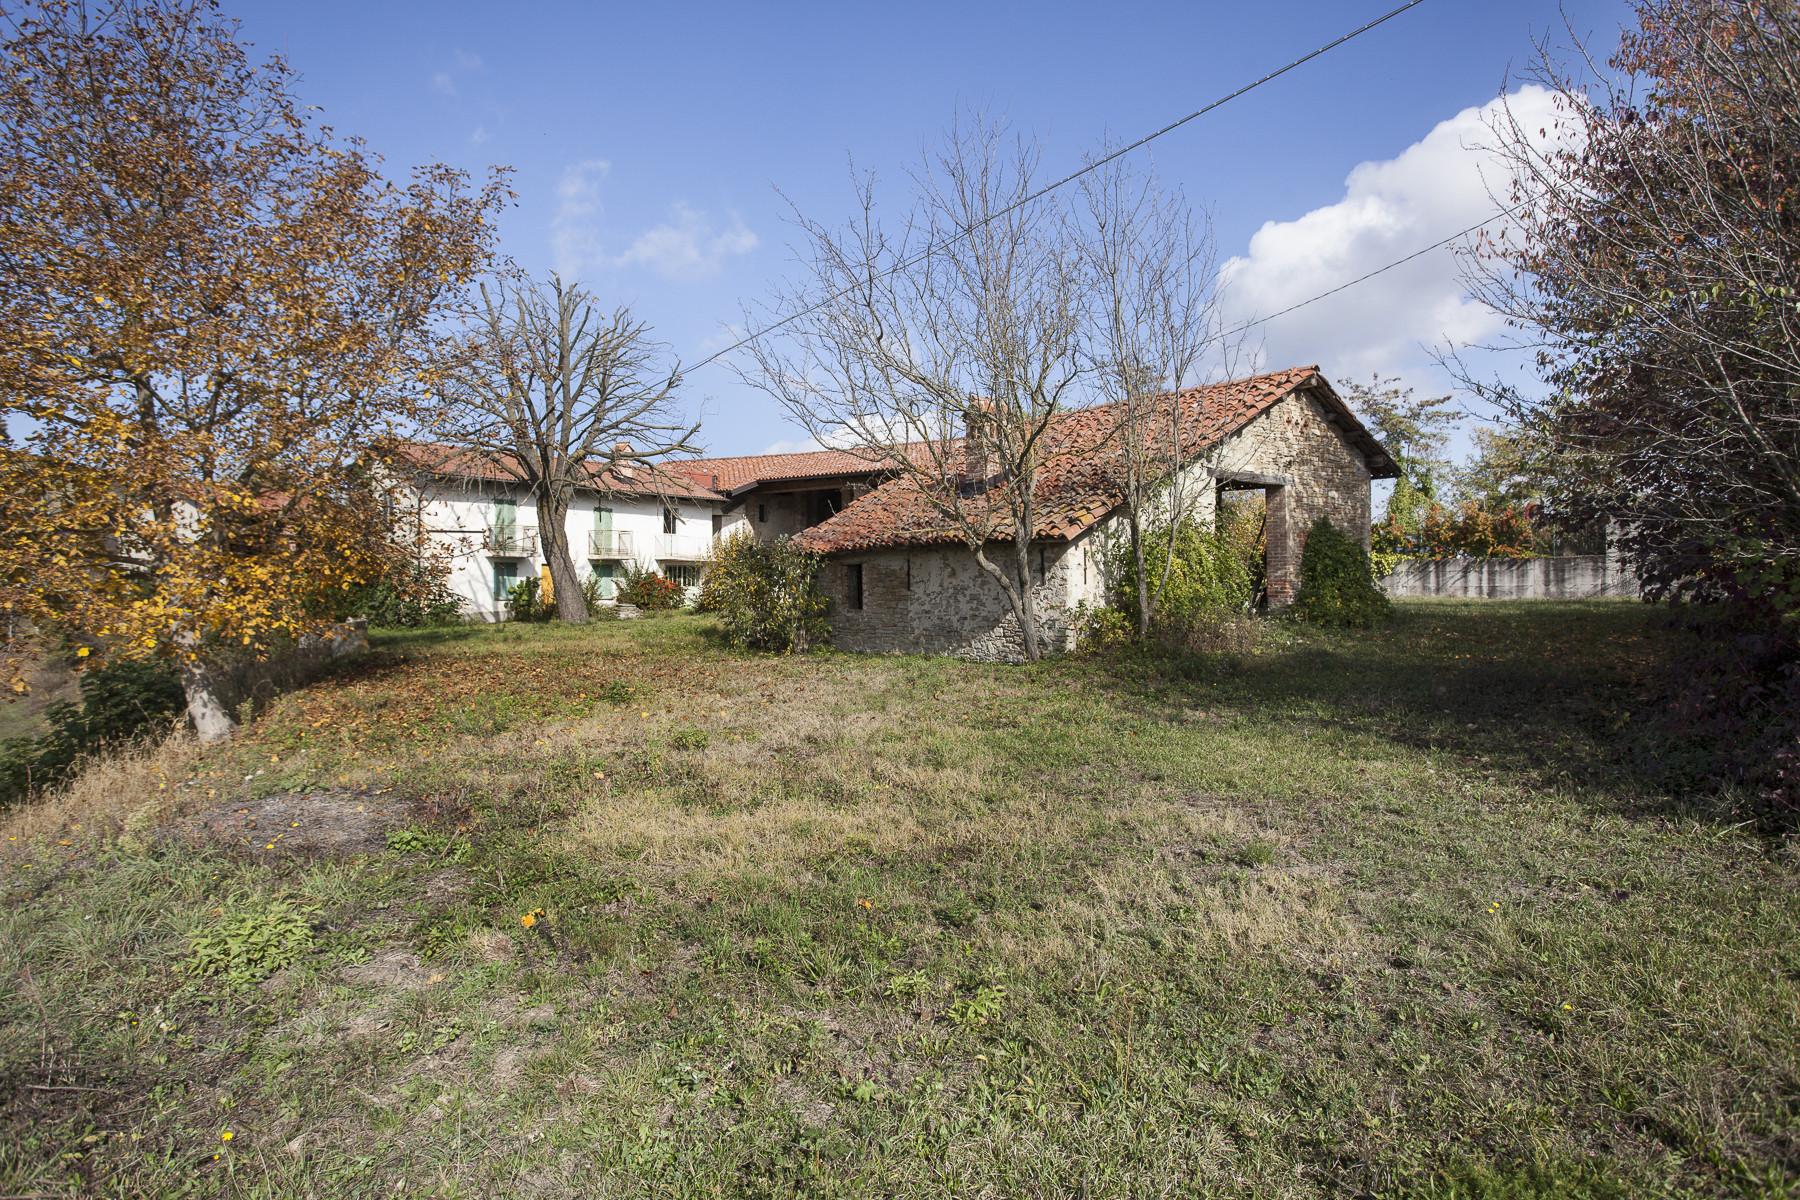 Villa in Vendita a Clavesana: 5 locali, 1130 mq - Foto 10